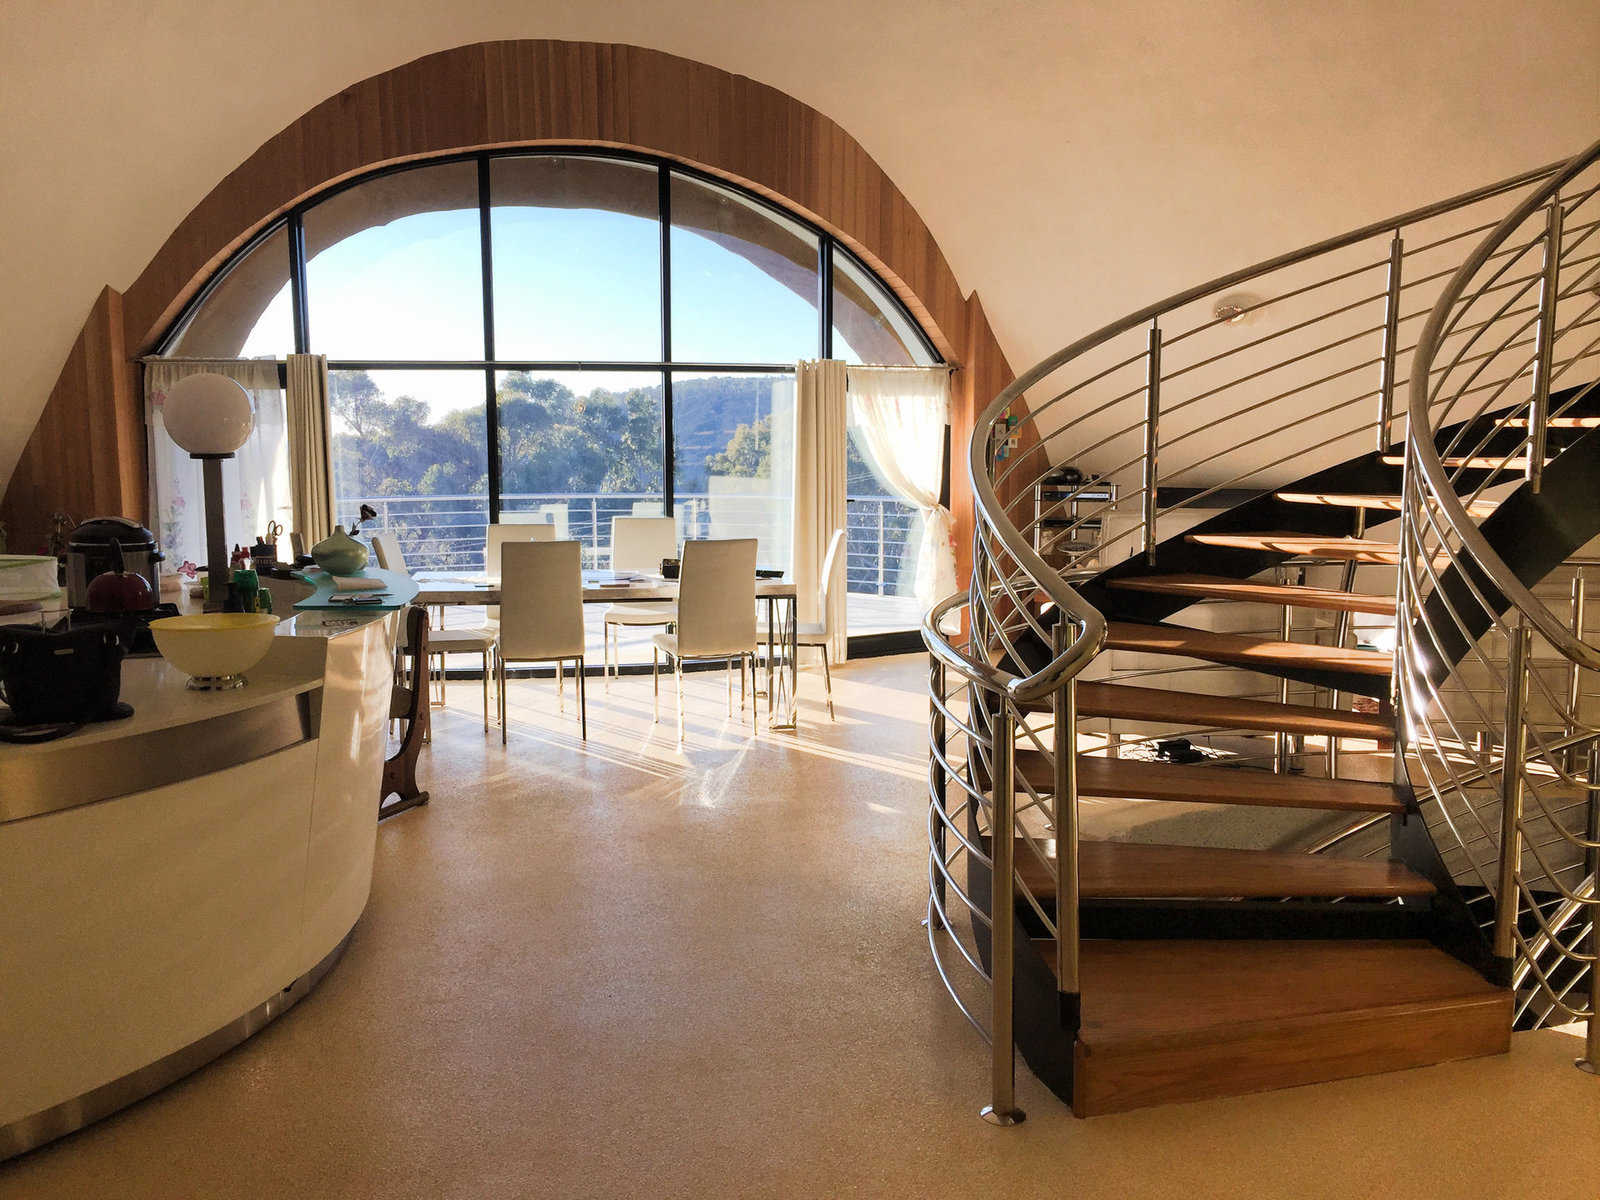 interior completed in australia dome home monolithic dome institute